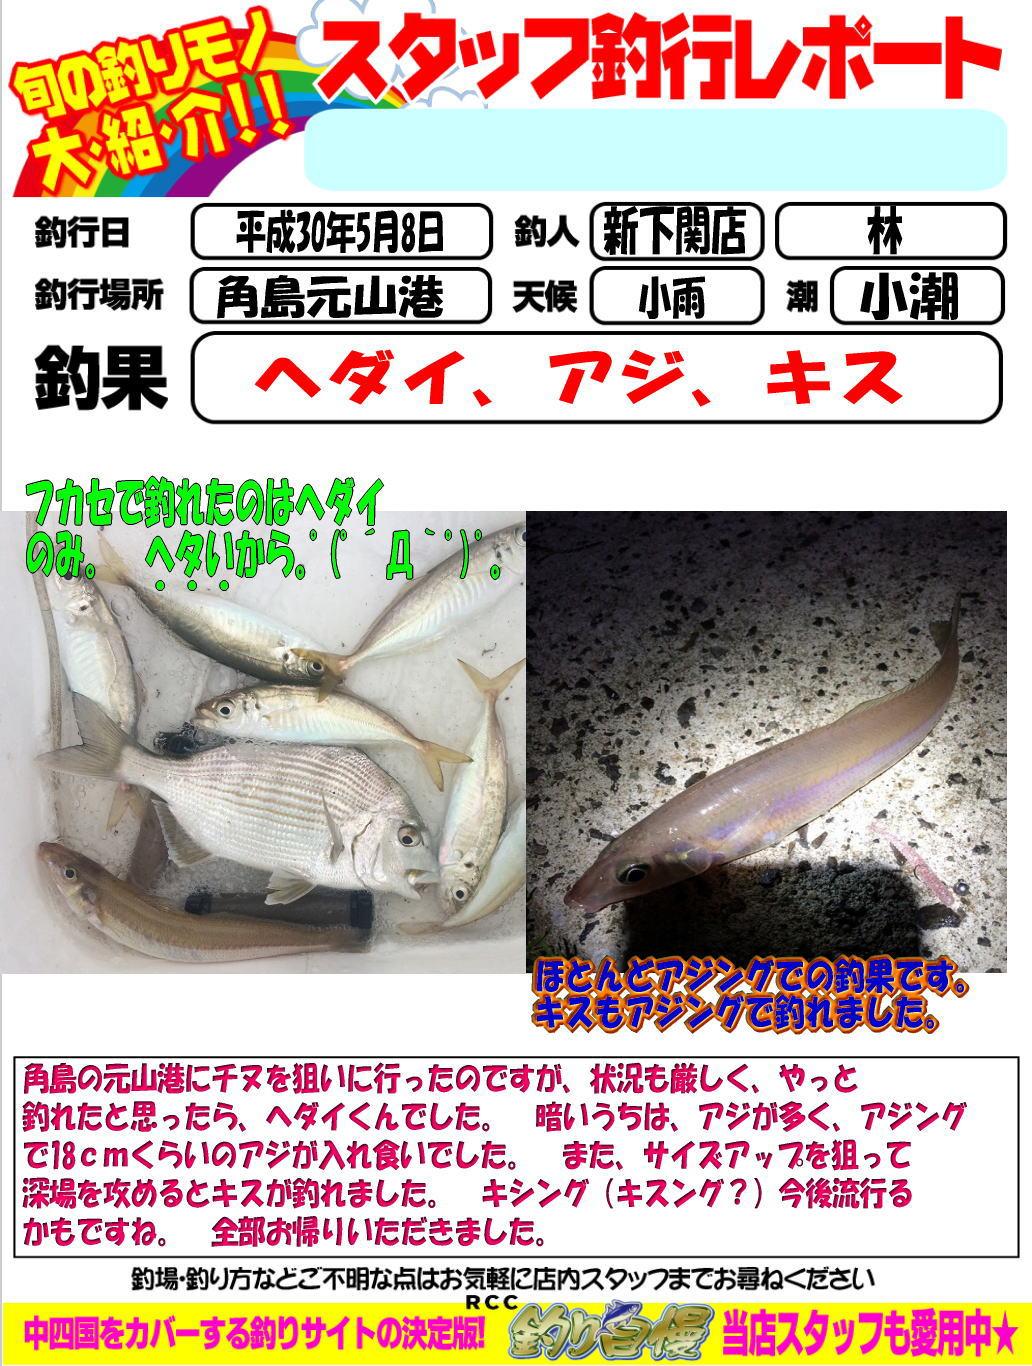 http://www.e-angle.co.jp/shop/blog/20180508%E8%A7%92%E5%B3%B6.jpg